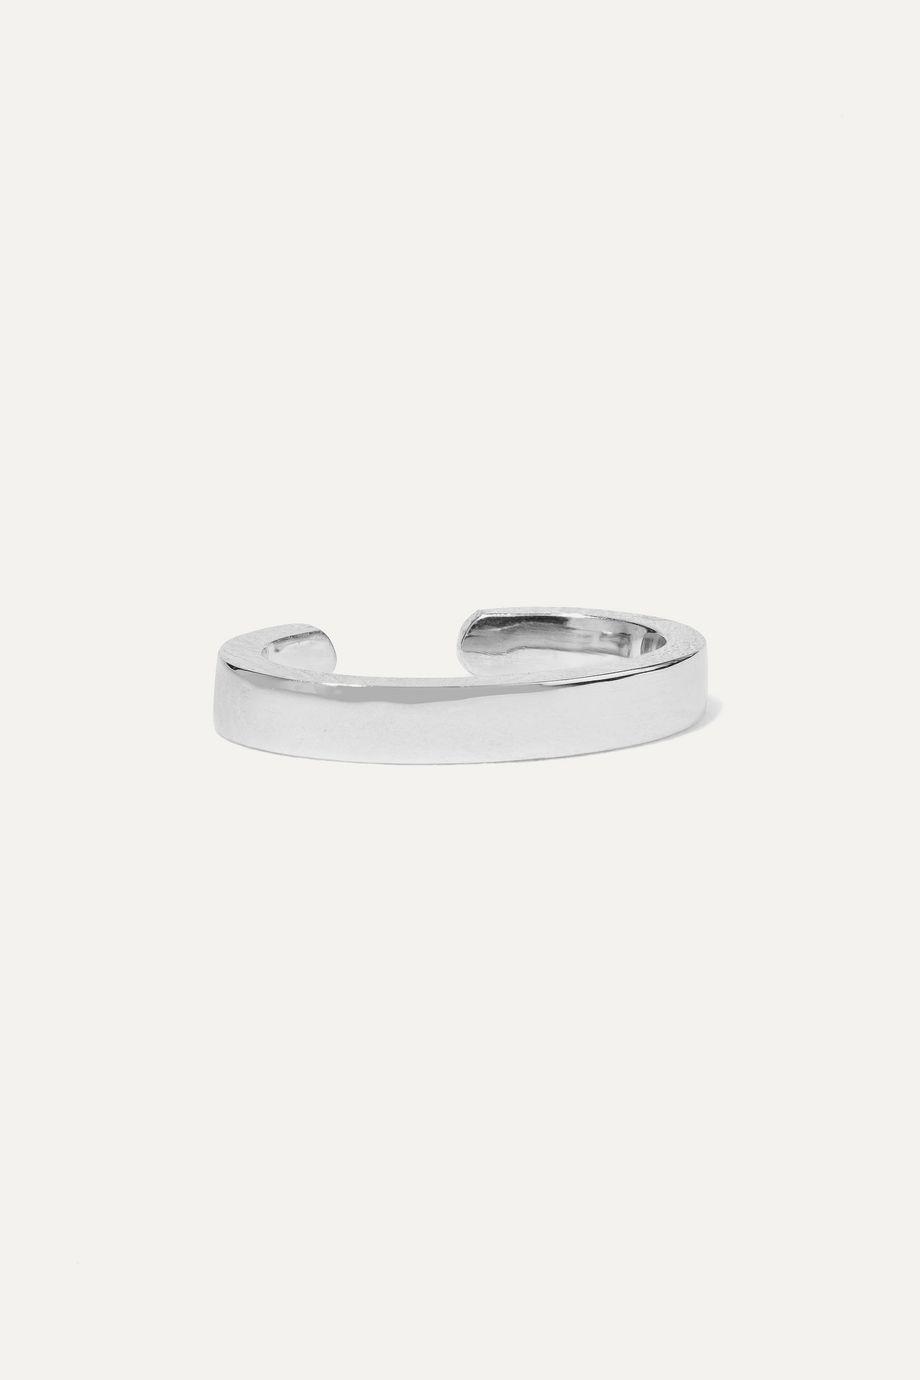 Anita Ko 18-karat white gold ear cuff